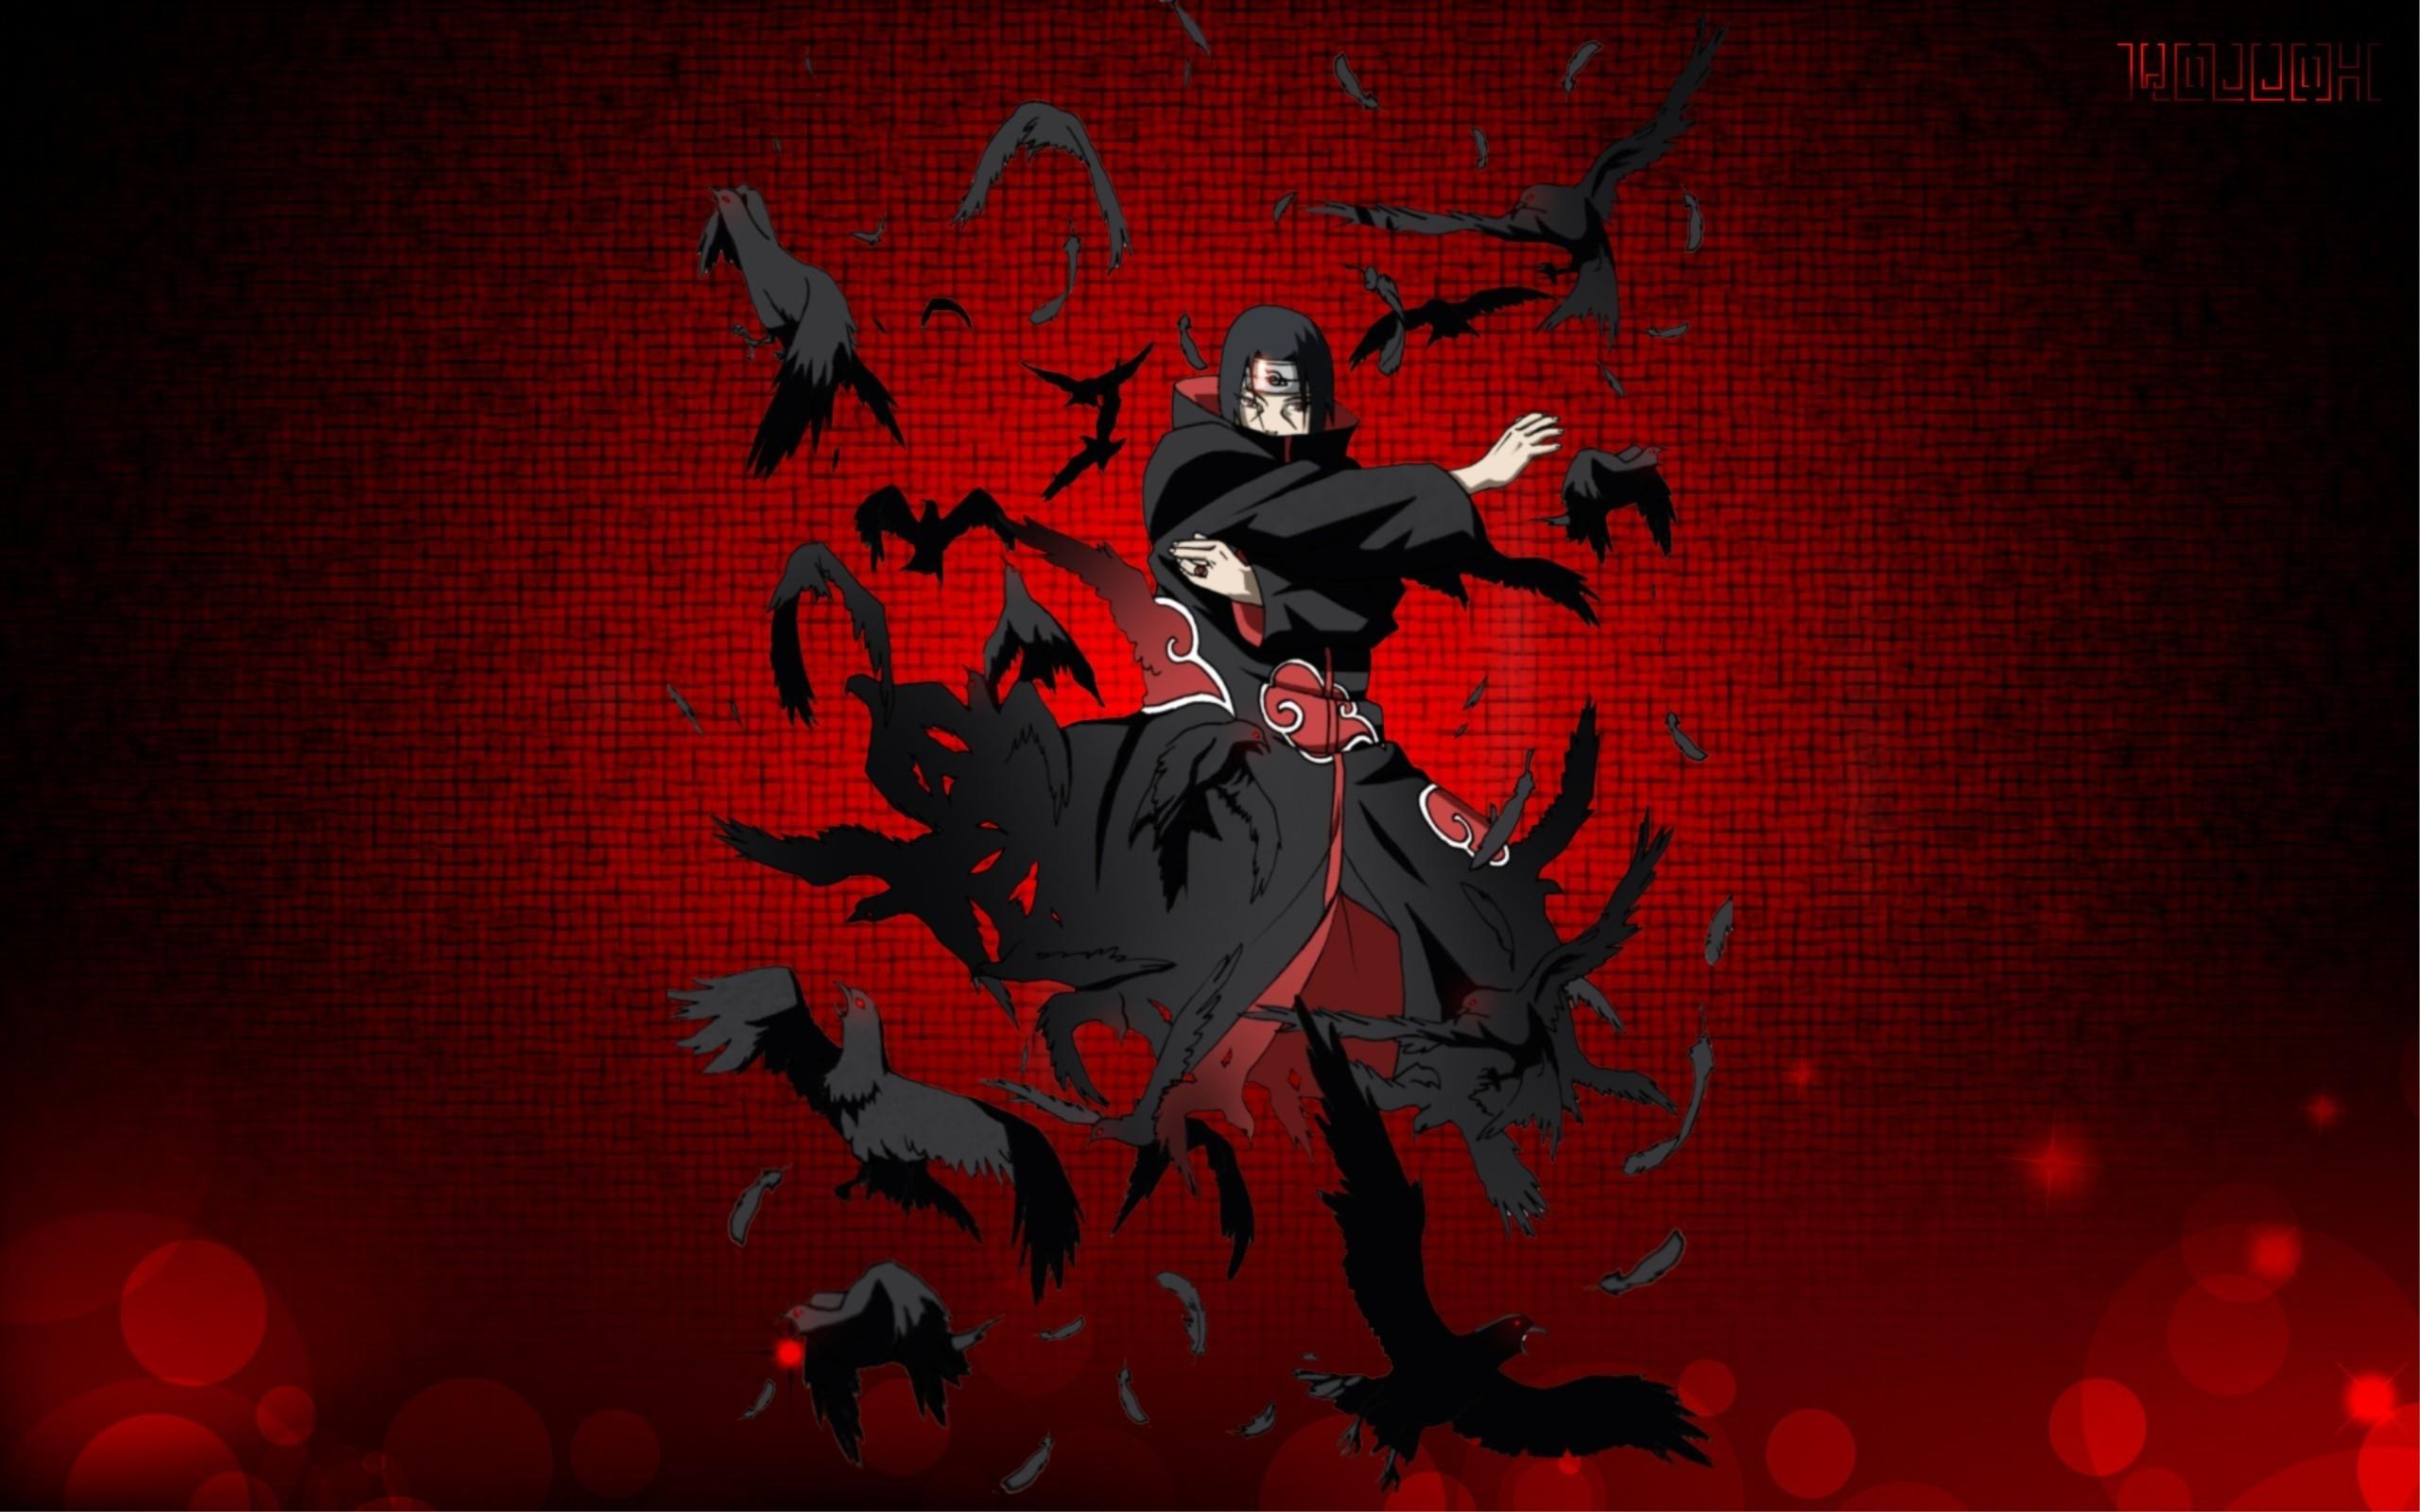 Res: 2560x1600, Naruto Shippuuden, Uchiha Itachi, Anime, Anime Boys, Akatsuki, Raven  Wallpapers HD / Desktop and Mobile Backgrounds